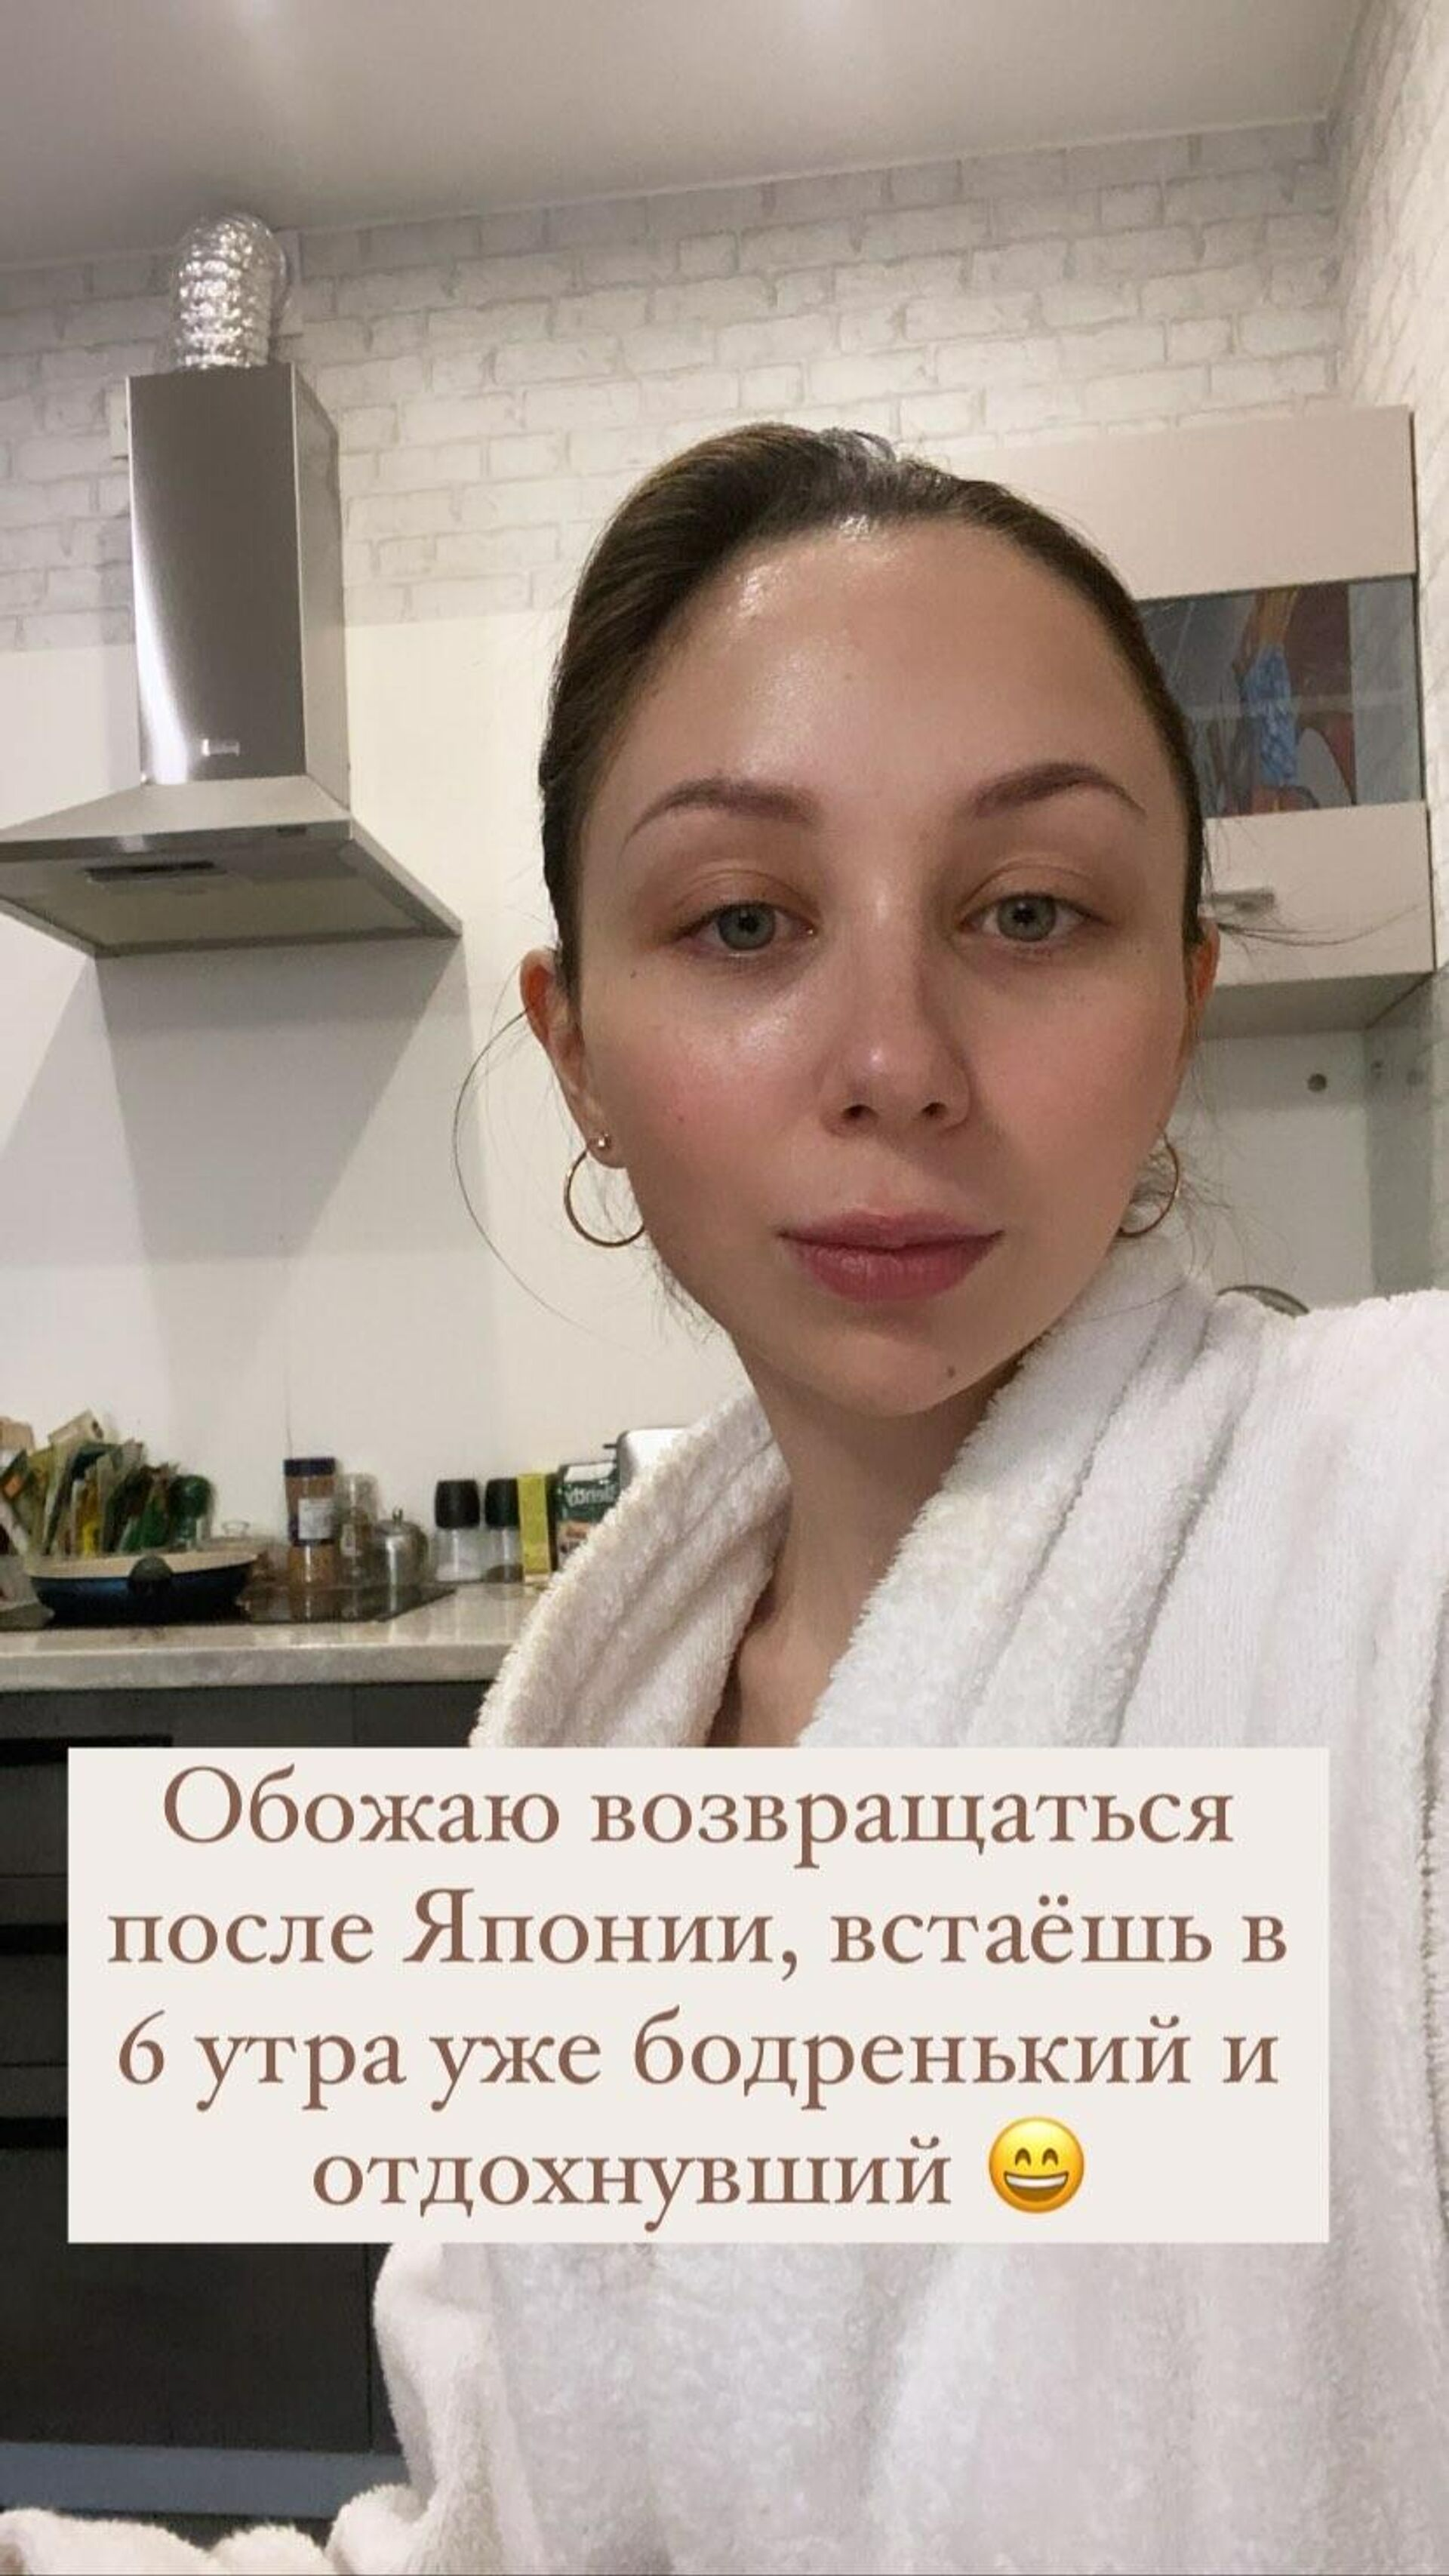 Елизавета Туктамышева. - РИА Новости, 1920, 20.04.2021